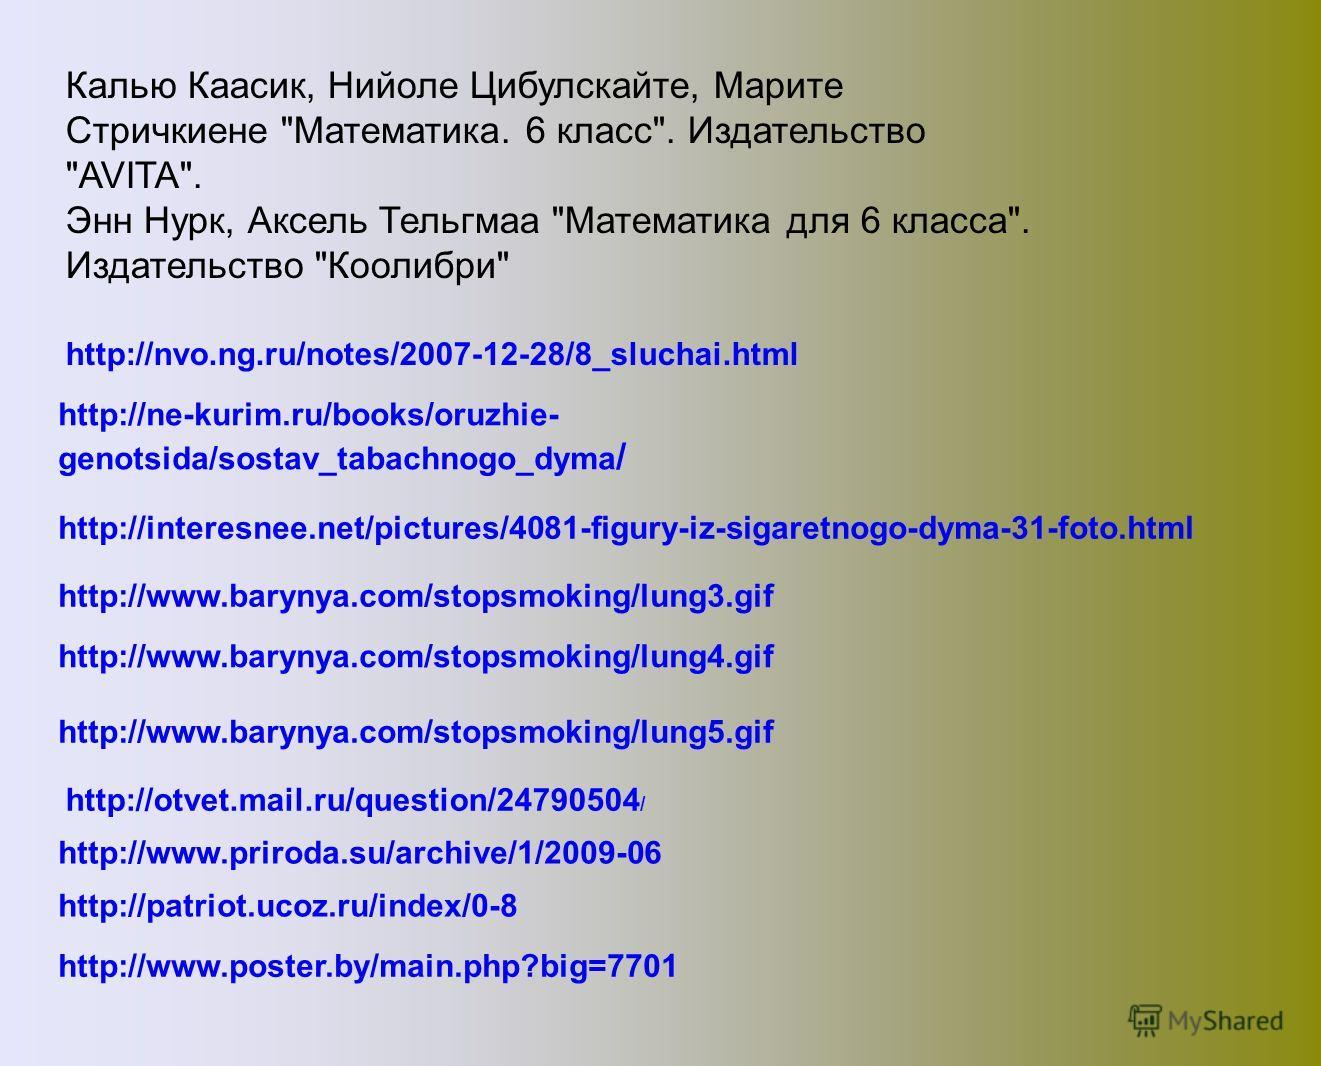 http://patriot.ucoz.ru/index/0-8 http://ne-kurim.ru/books/oruzhie- genotsida/sostav_tabachnogo_dyma / http://nvo.ng.ru/notes/2007-12-28/8_sluchai.html http://otvet.mail.ru/question/24790504 / http://www.barynya.com/stopsmoking/lung3.gif http://www.ba